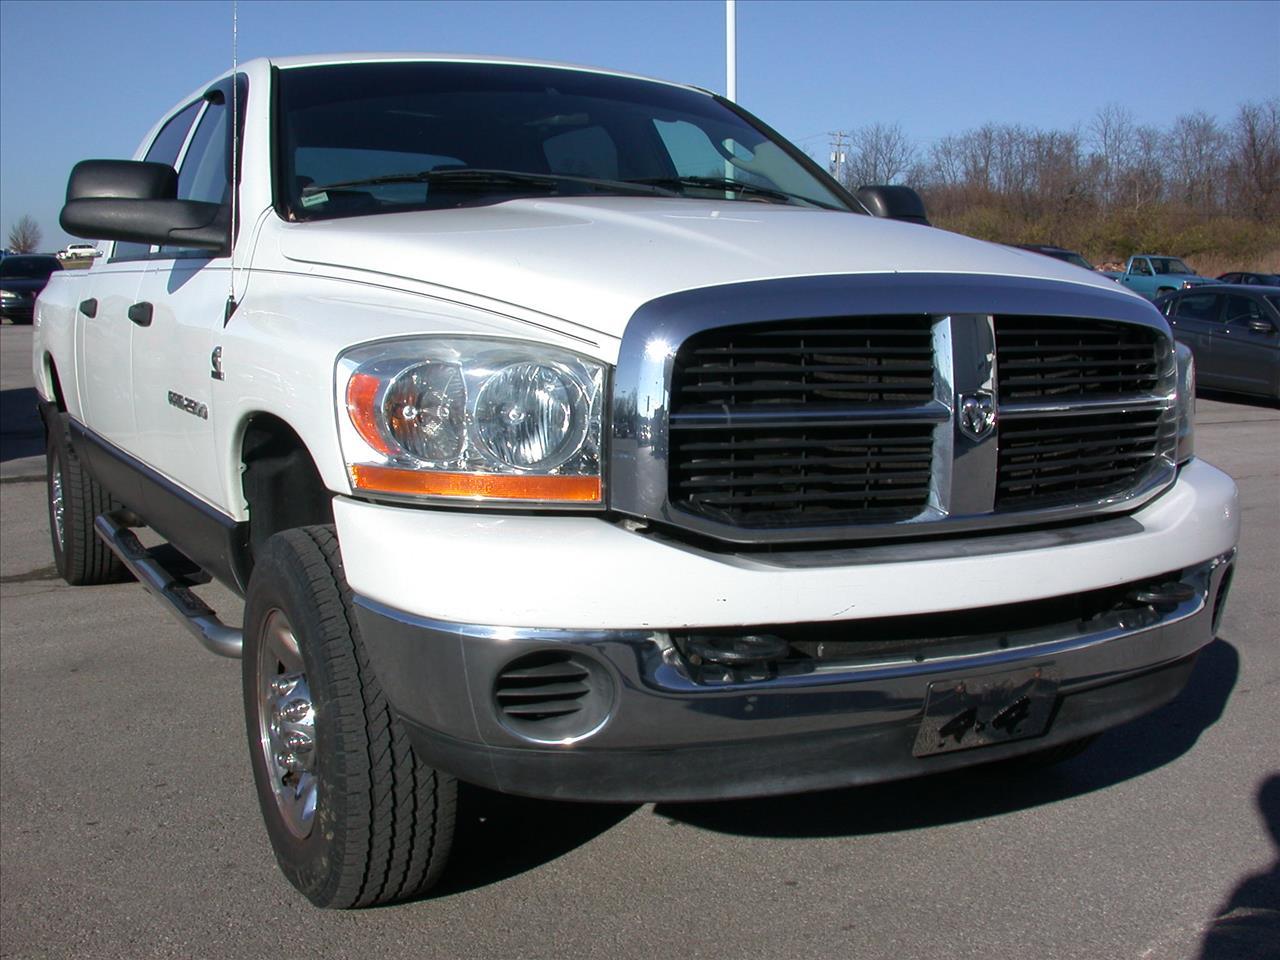 Cars For Sale In Richmond Ky Carsforsale Com